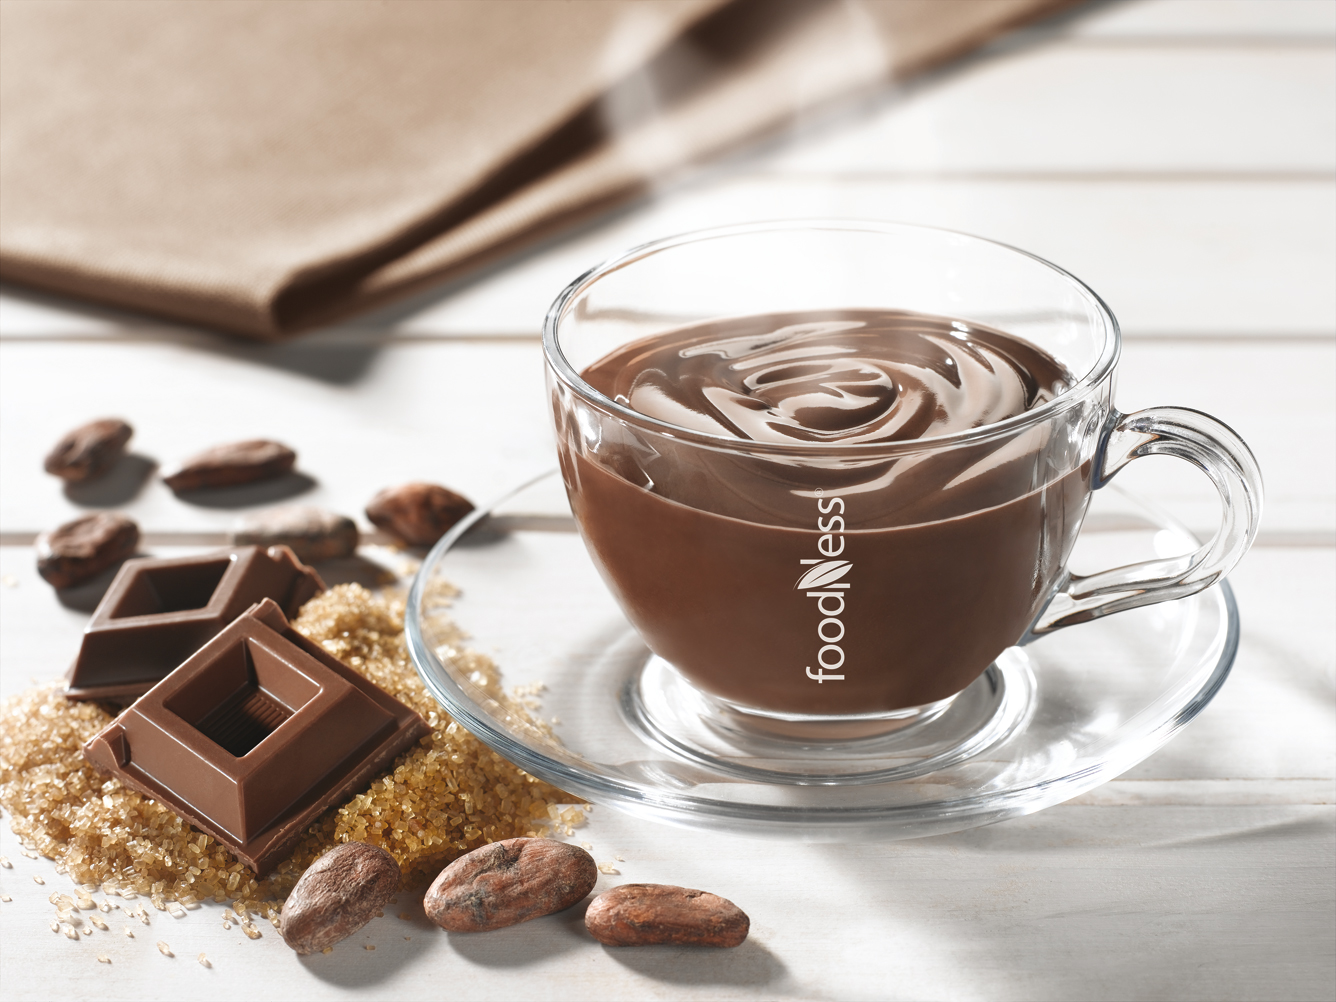 cioccolata-classica-foto-ambientata-lr